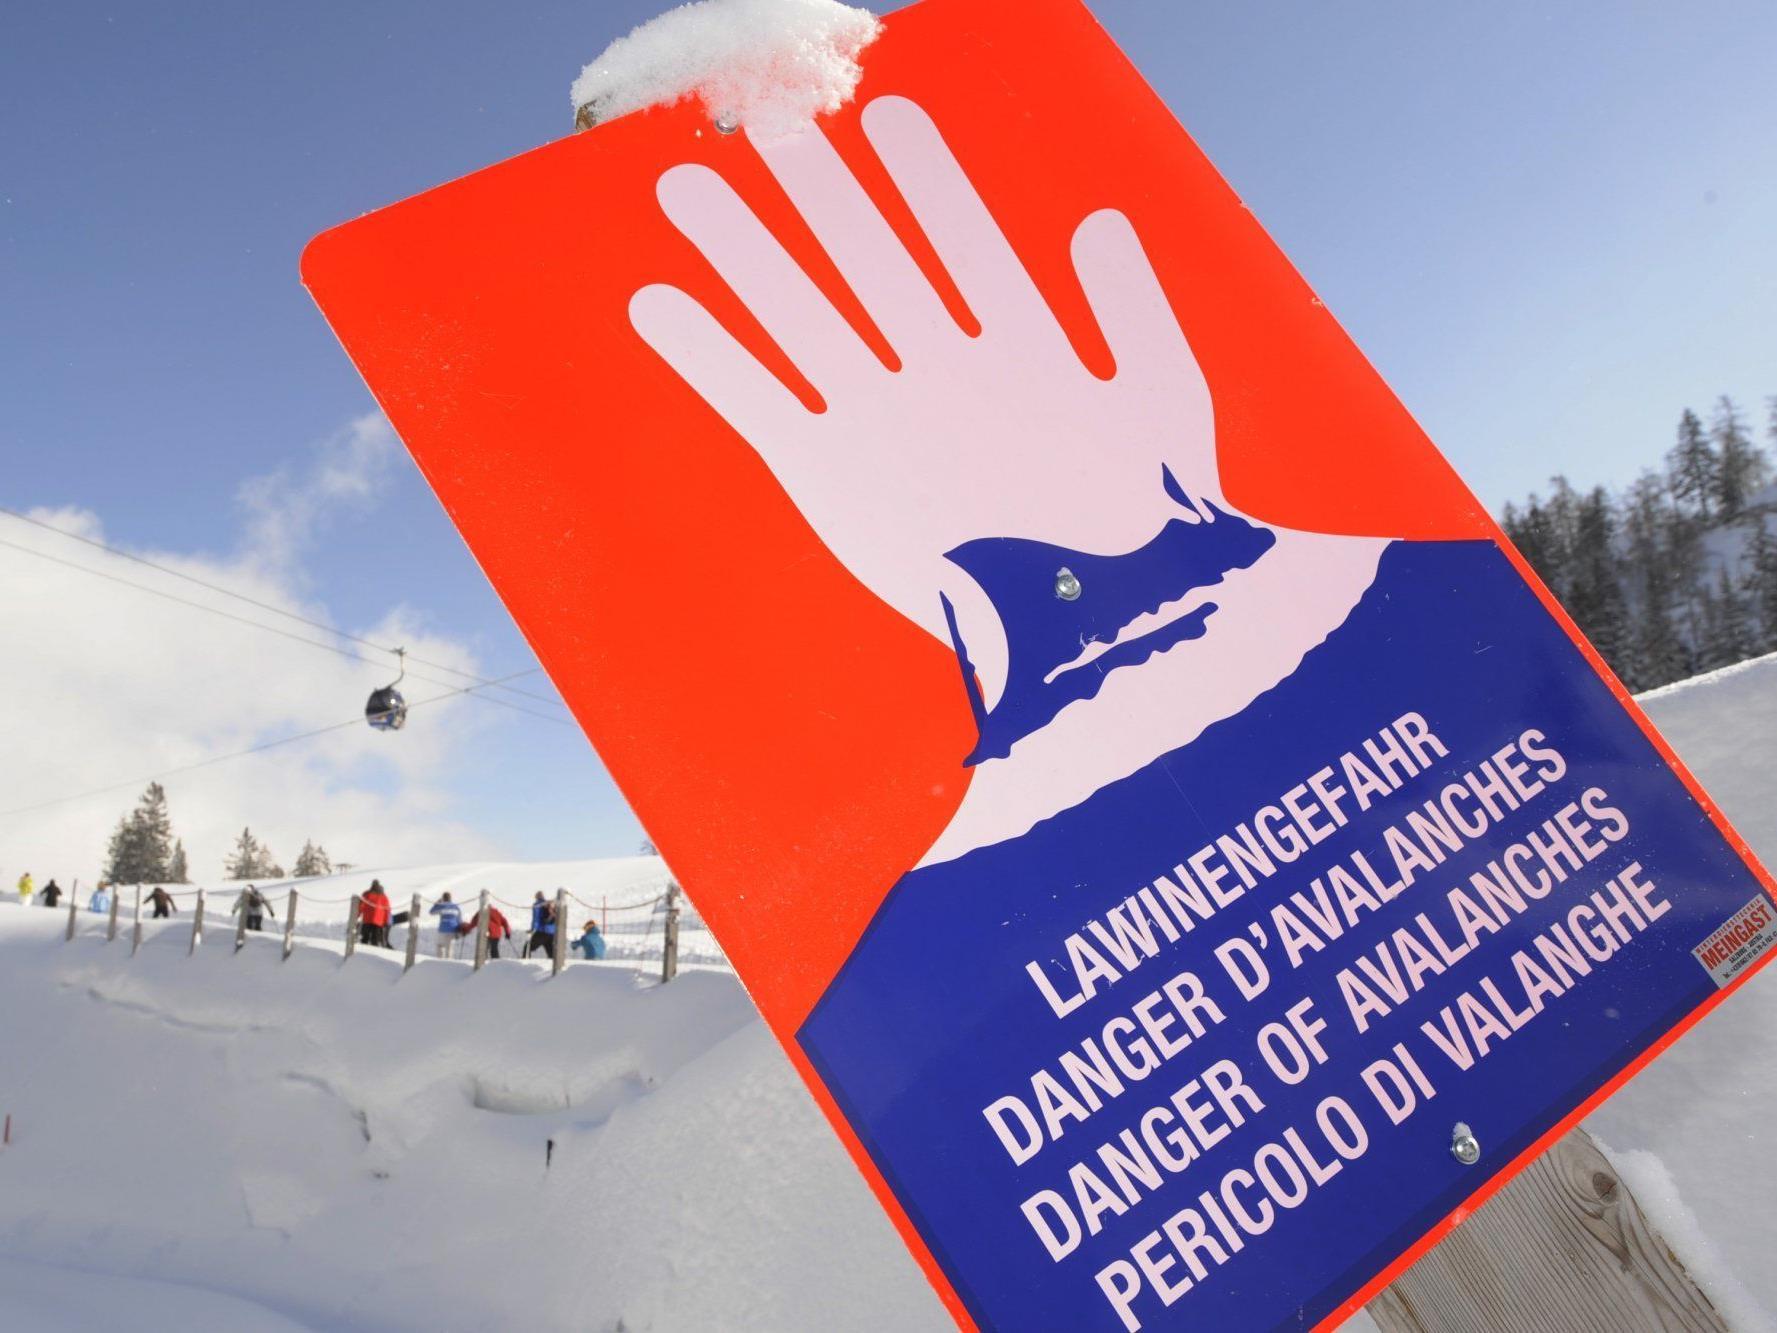 Verunglückter Vorarlberger war Snowboardlehrer im Pitztal.